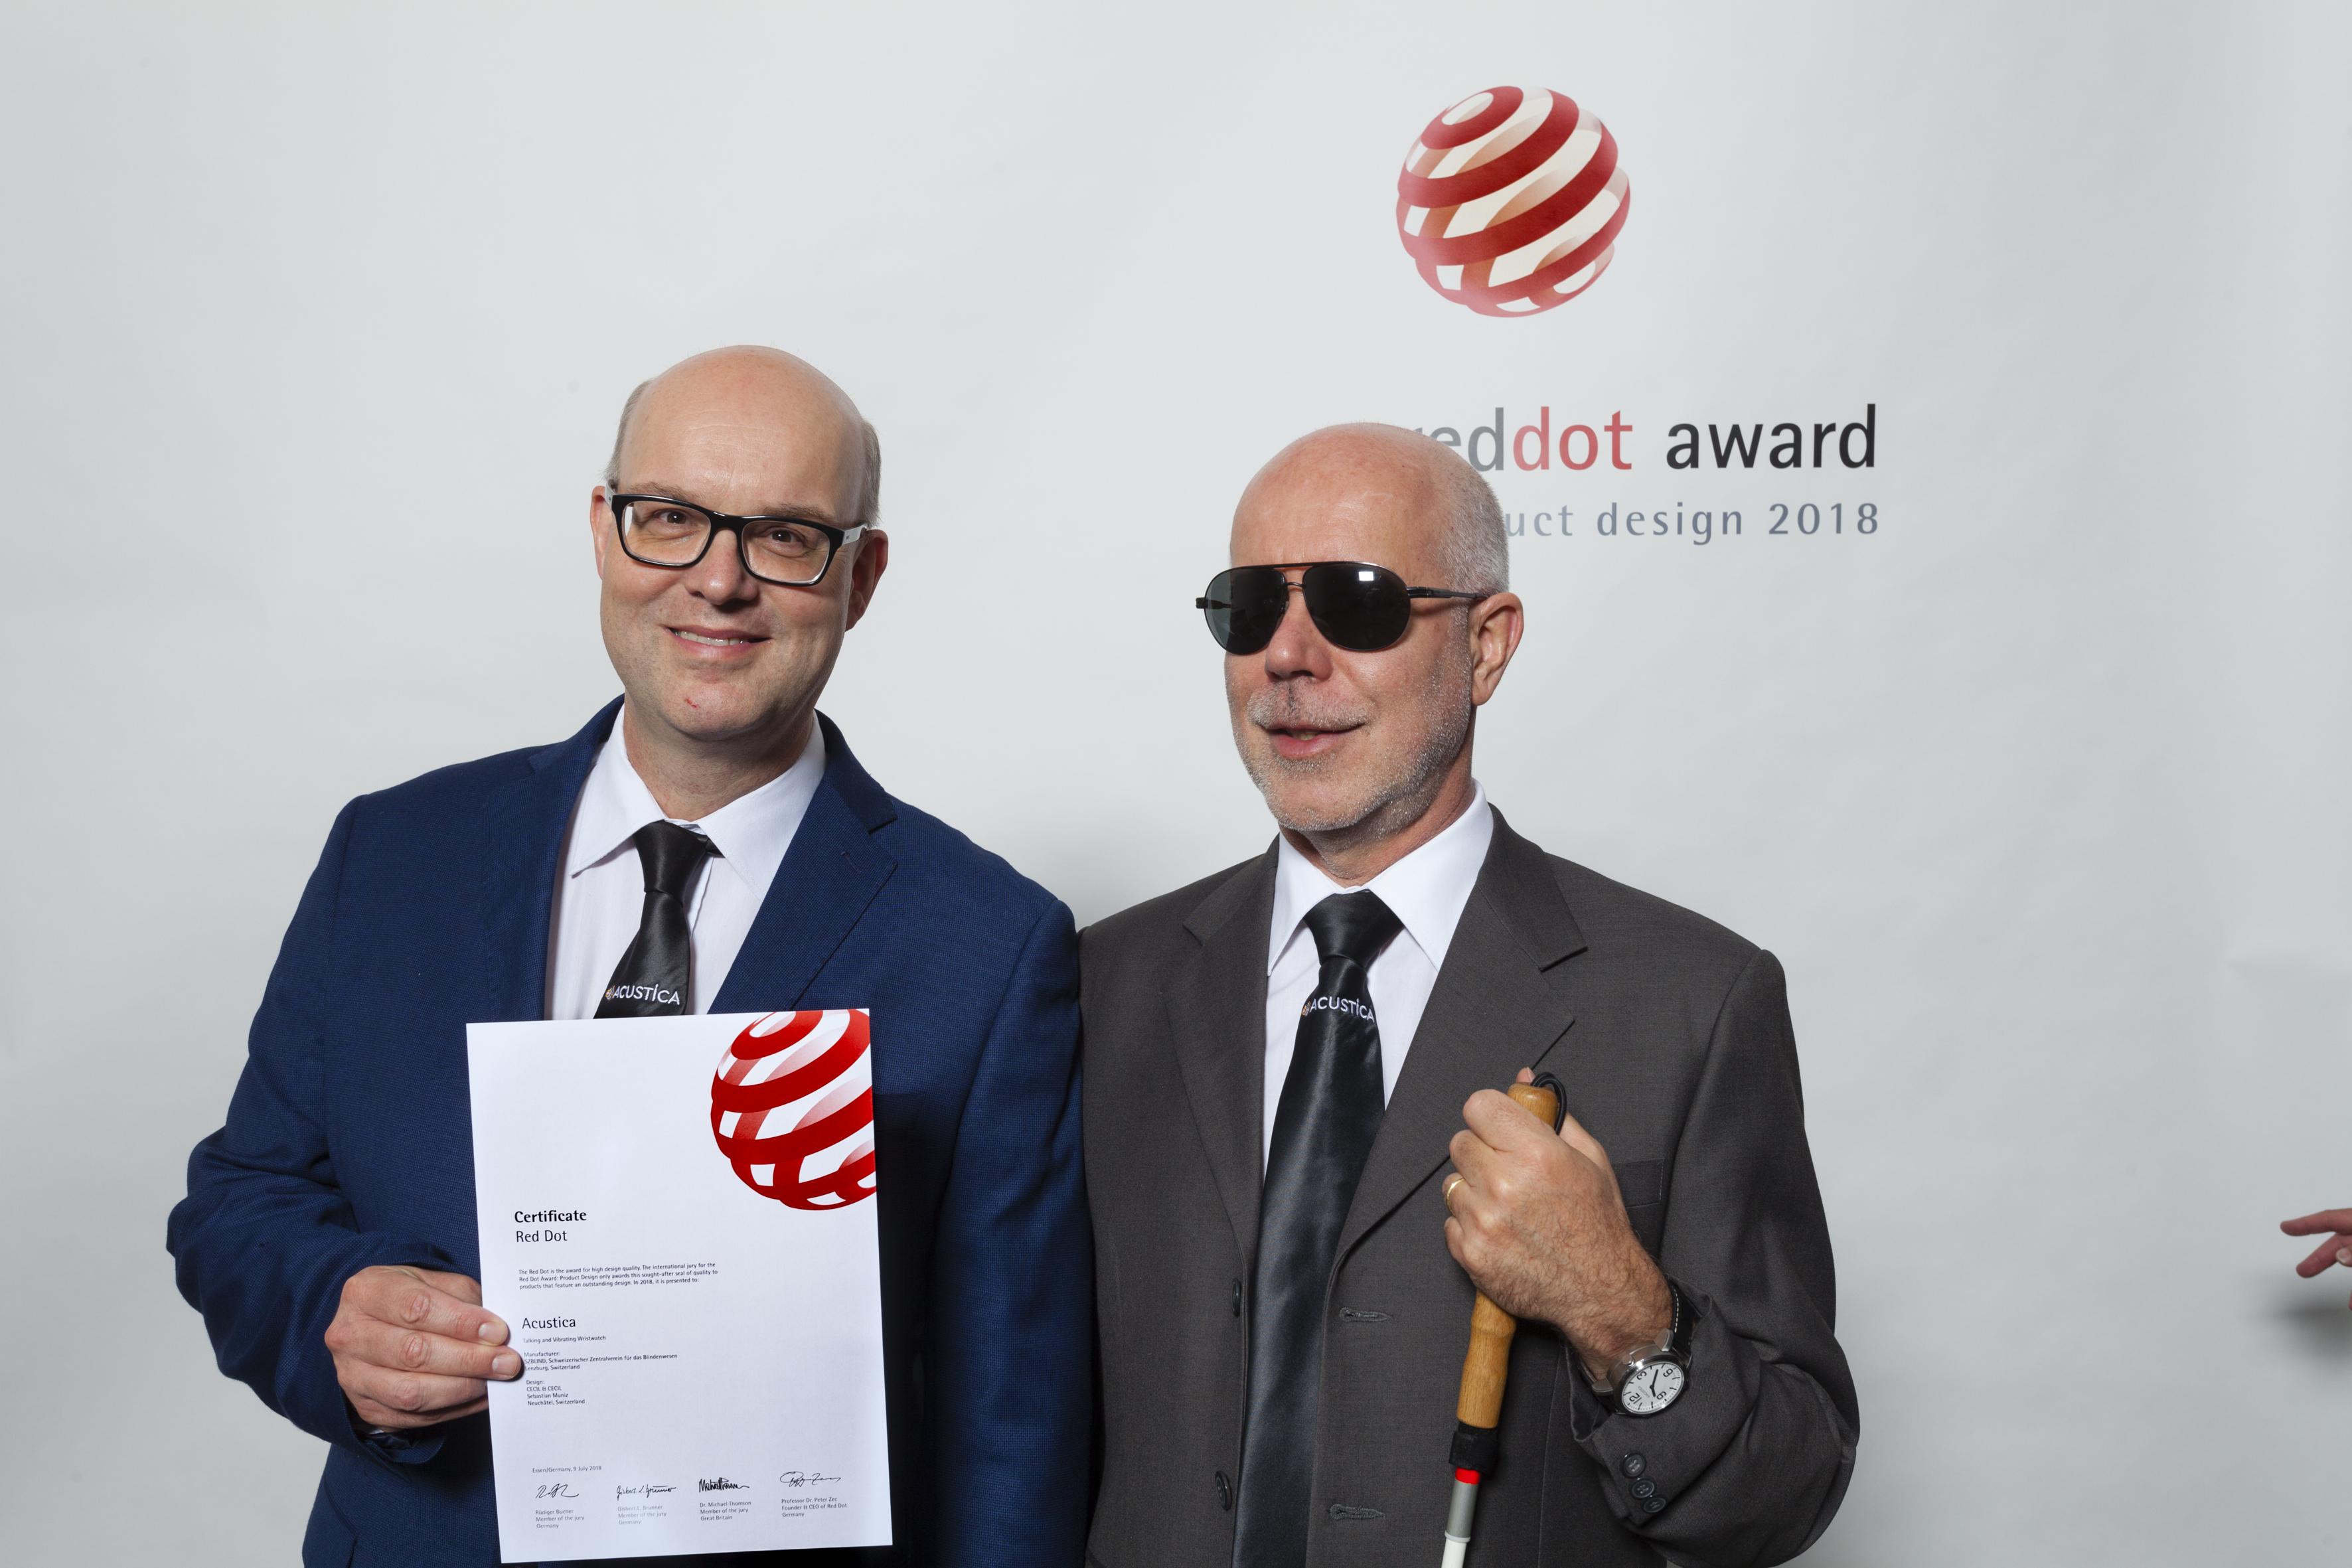 La montre parlante de l'UCBA a reçu le Red Dot Award